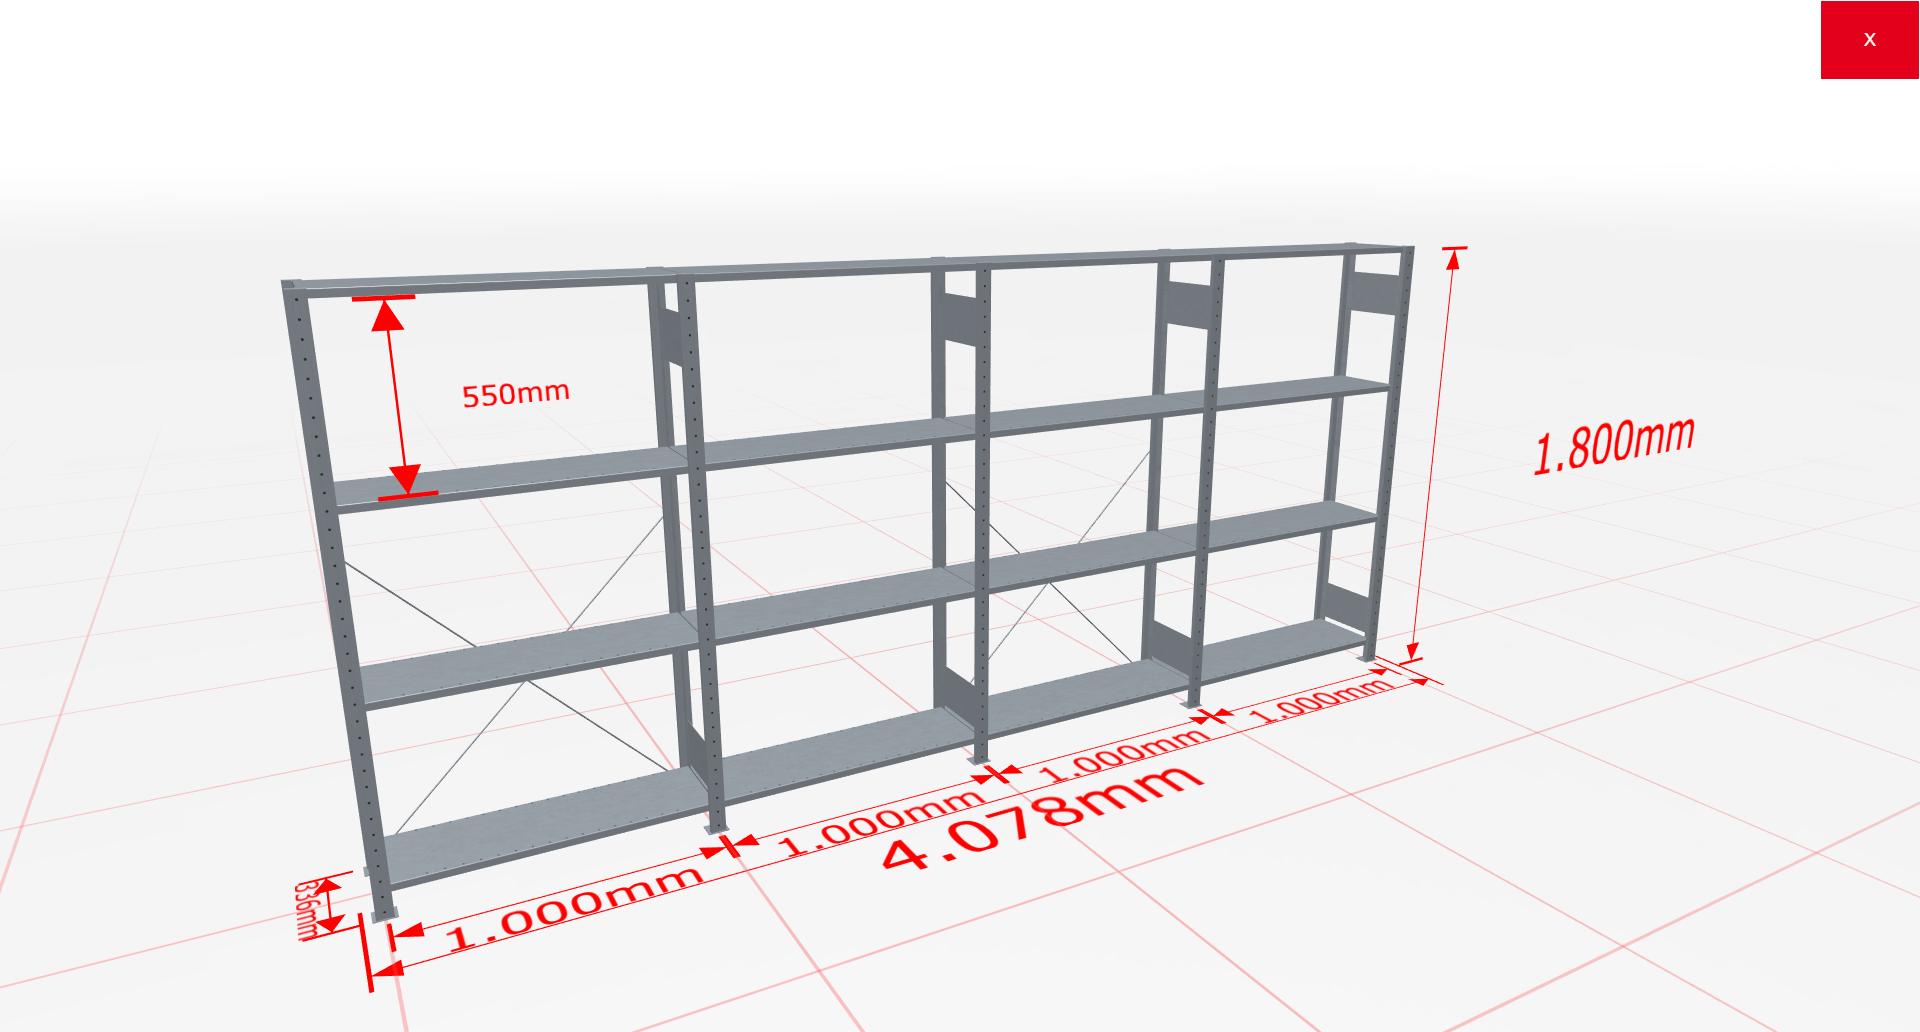 Fachbodenregal Komplettregal 1800x4078x300 mm (HxBxT) SCHULTE Lagertechnik verzinkt 4 Ebenen  150 kg je Boden